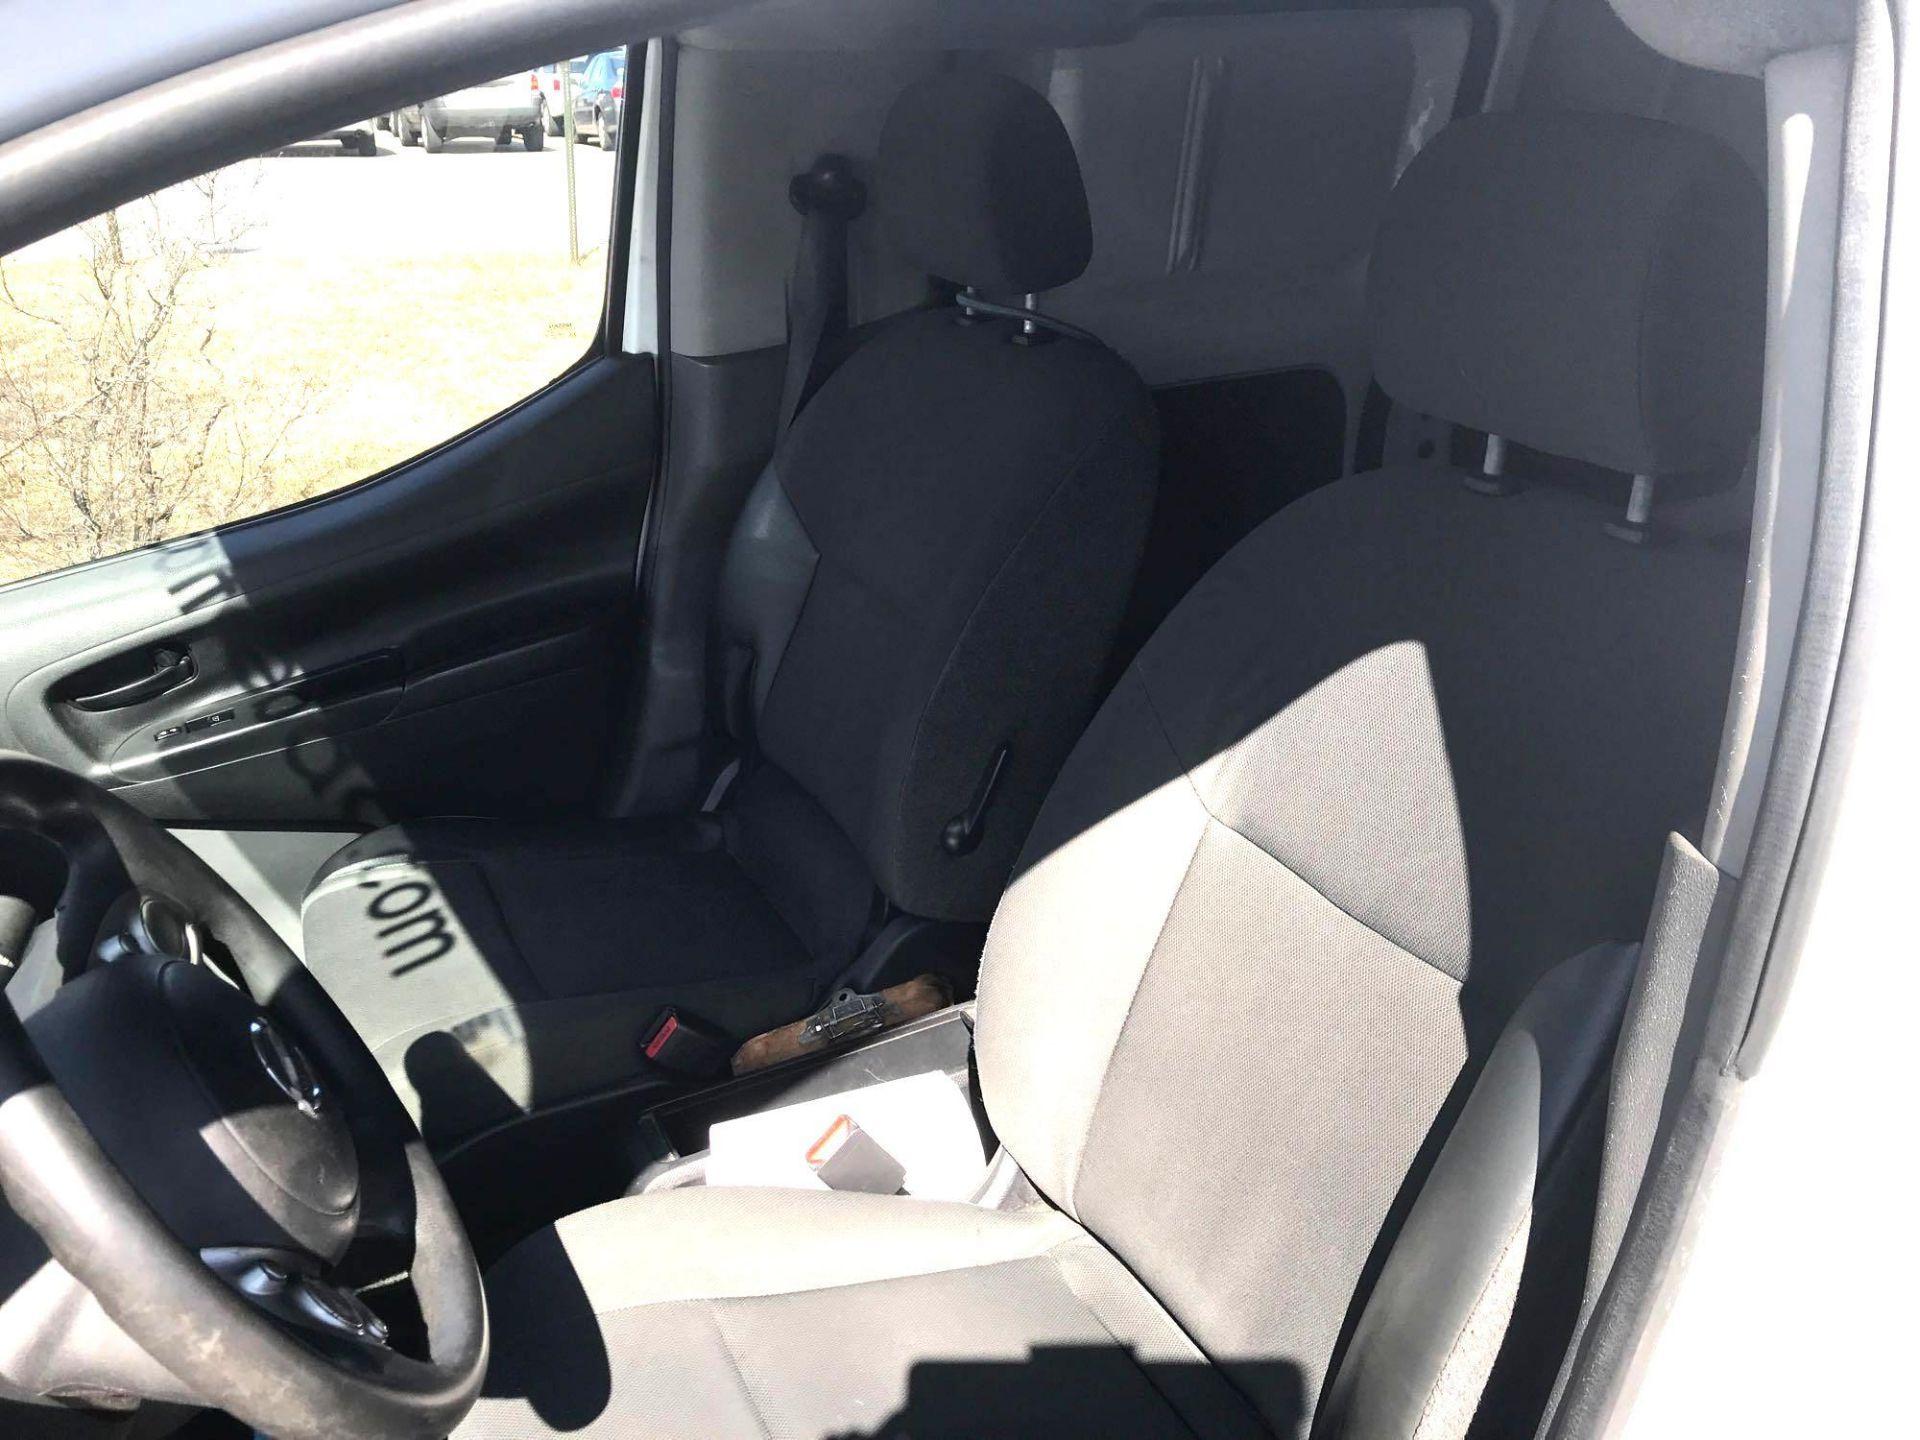 2013 Nissan NV200 Delivery Van - Image 6 of 54